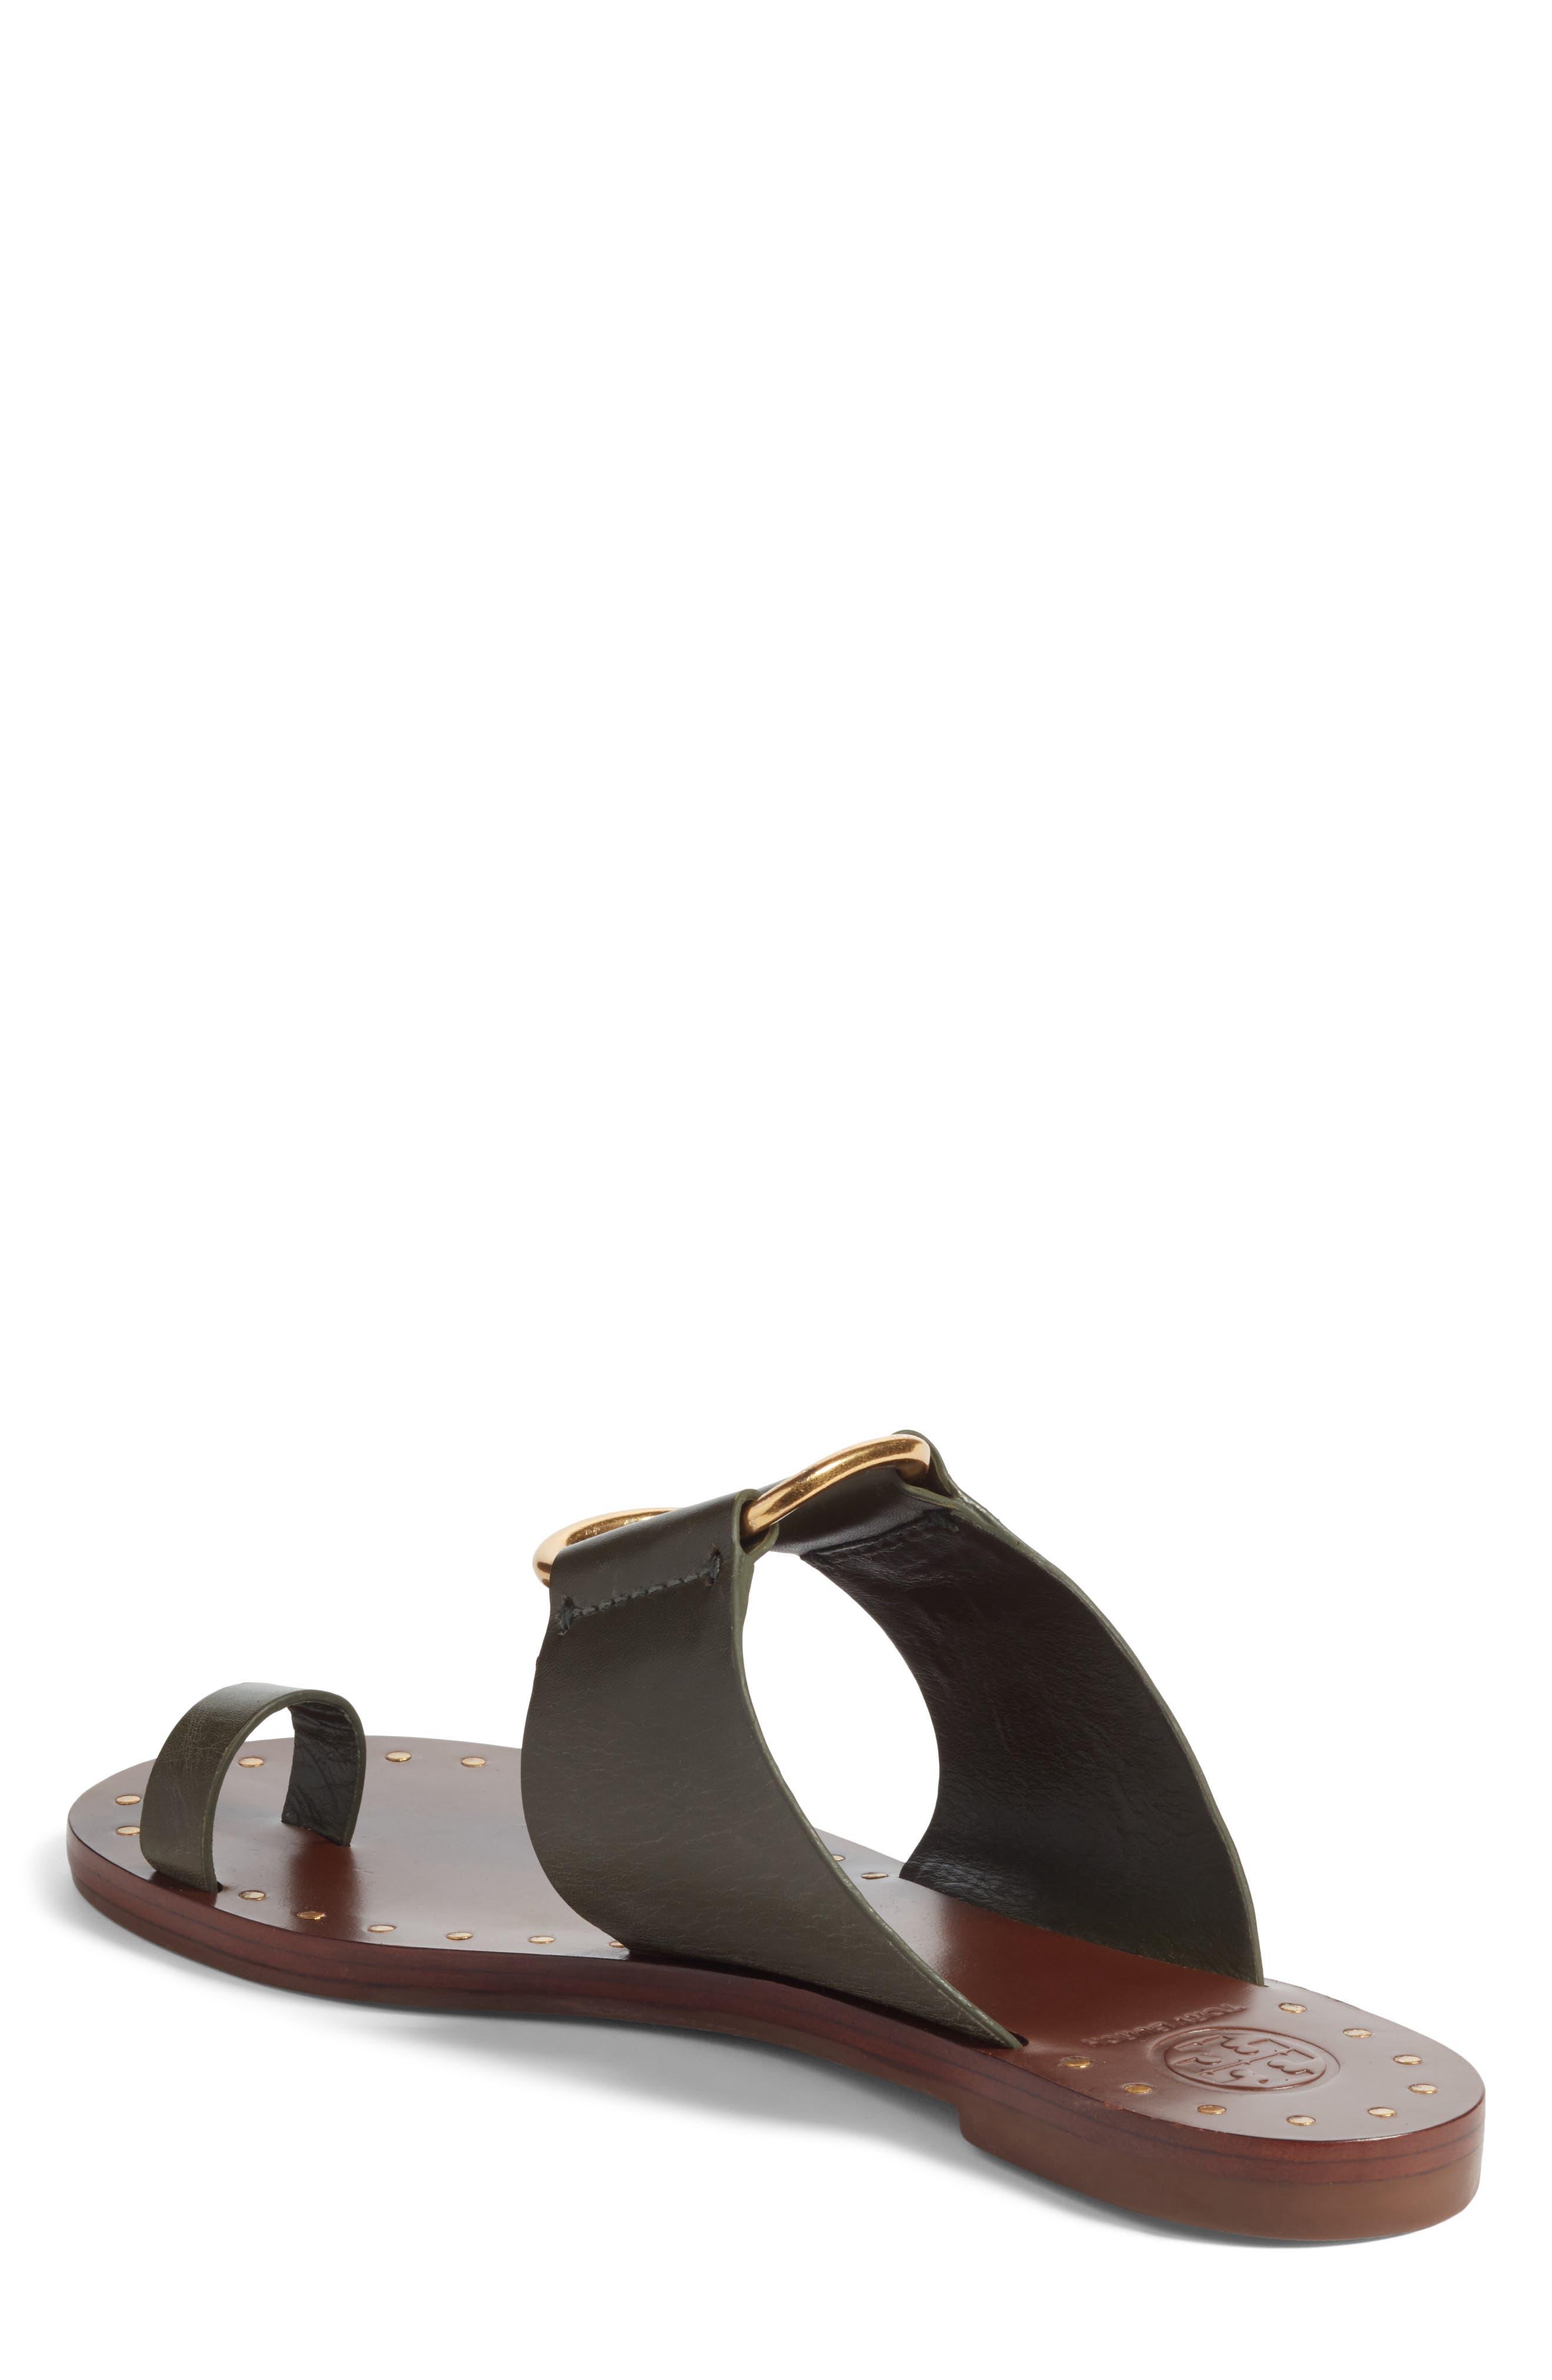 Brannan Studded Sandal,                             Alternate thumbnail 2, color,                             LECCIO